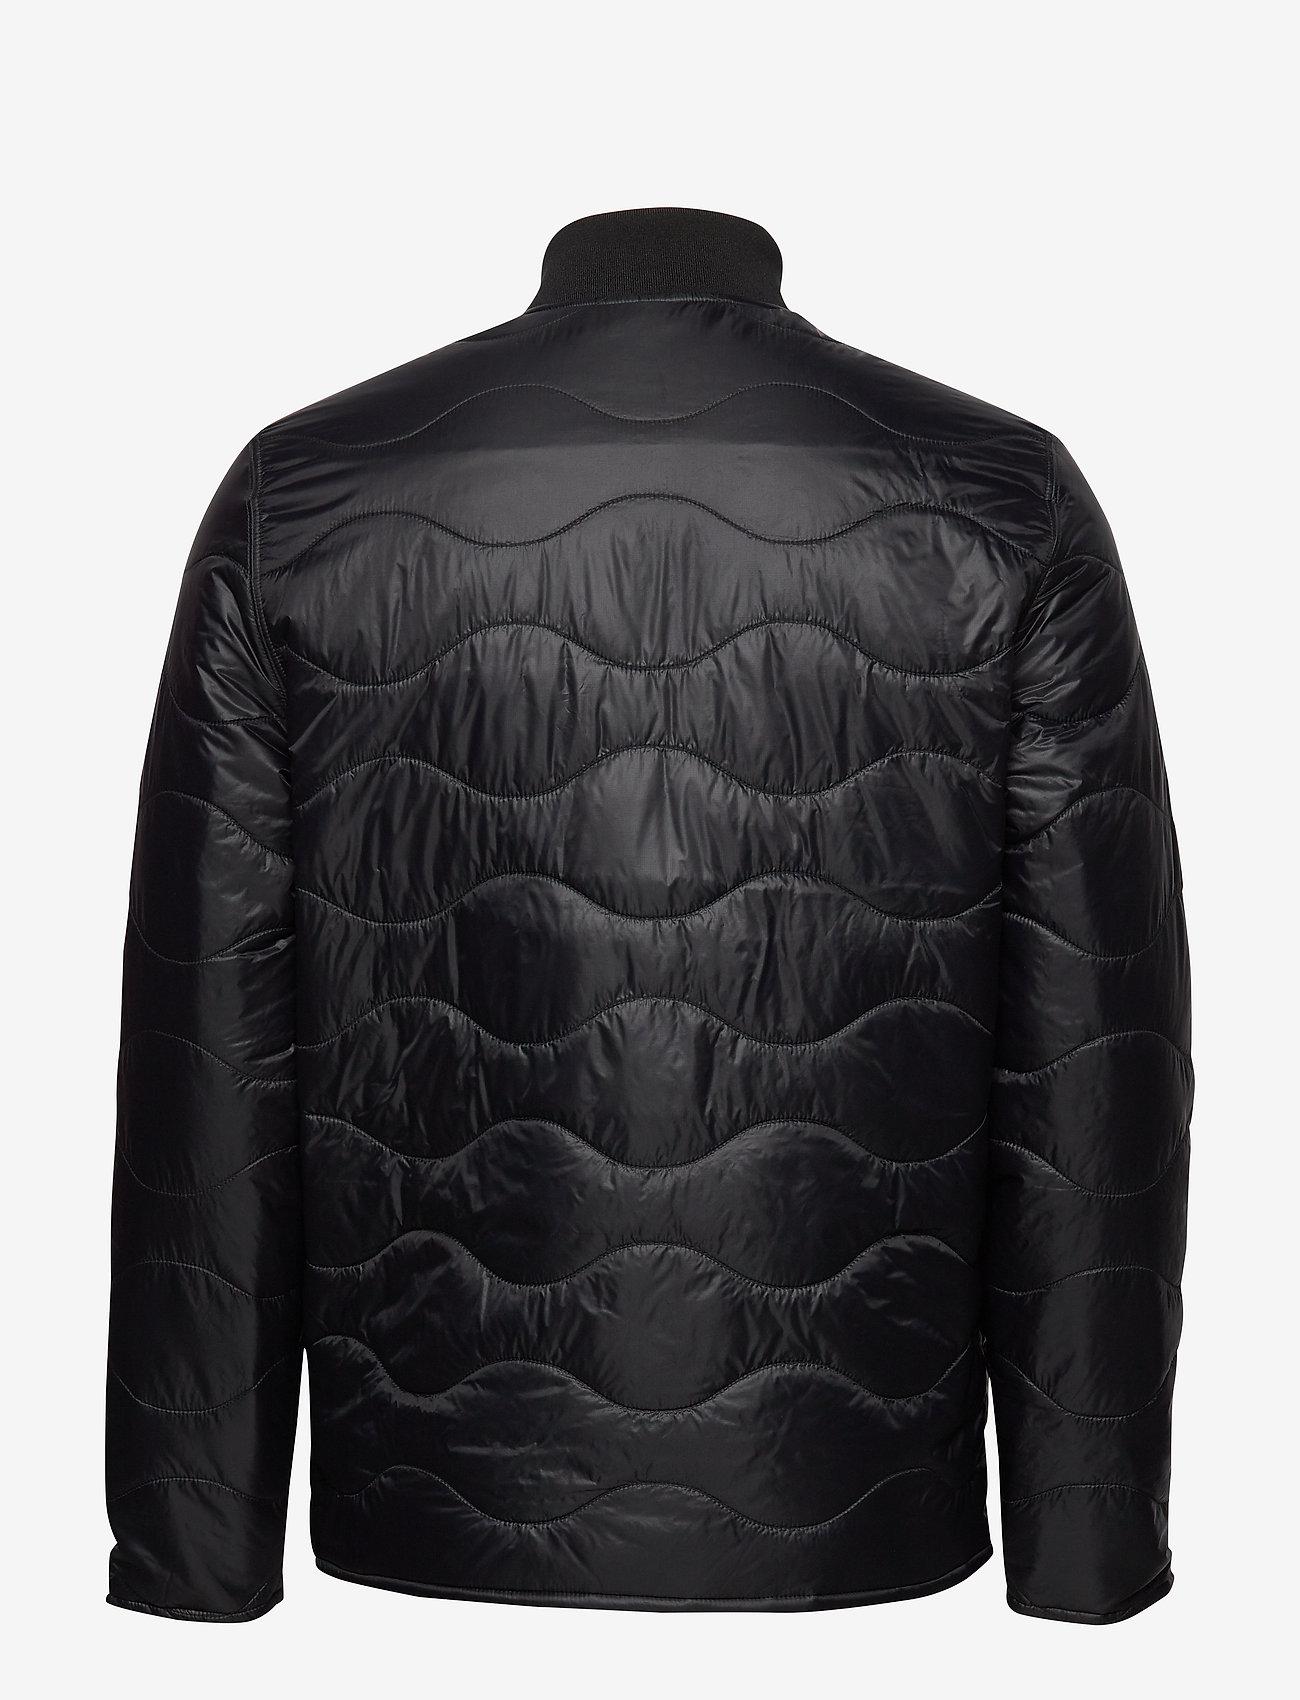 M X.14 Ozone Jacket (Black) - Peak Performance I4uAd0